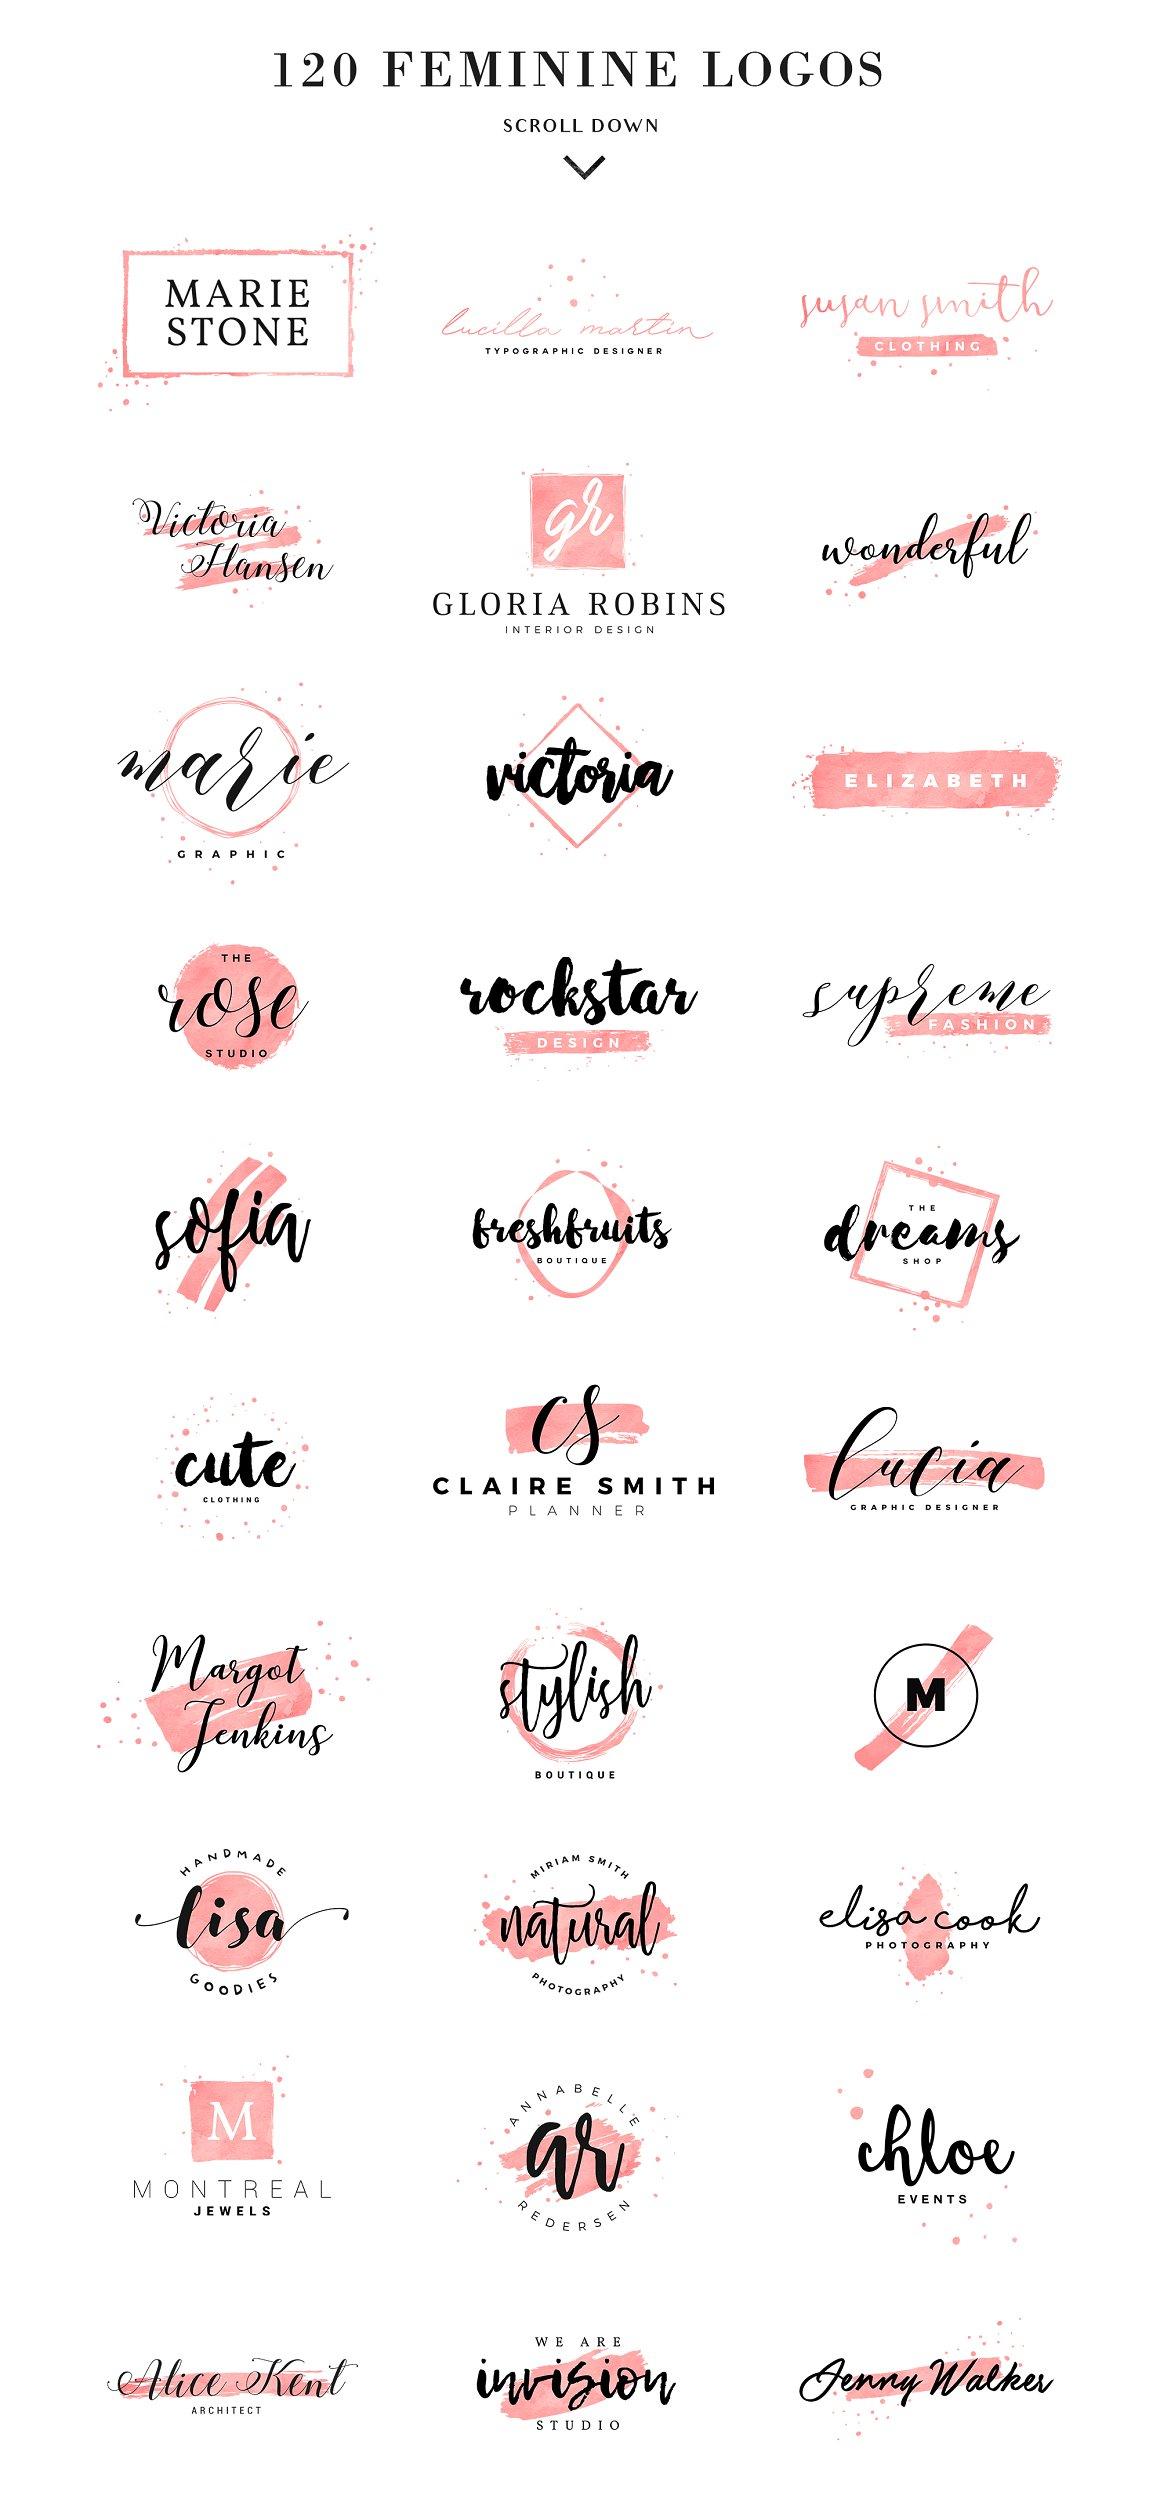 120 Feminine Branding Logos - Logos